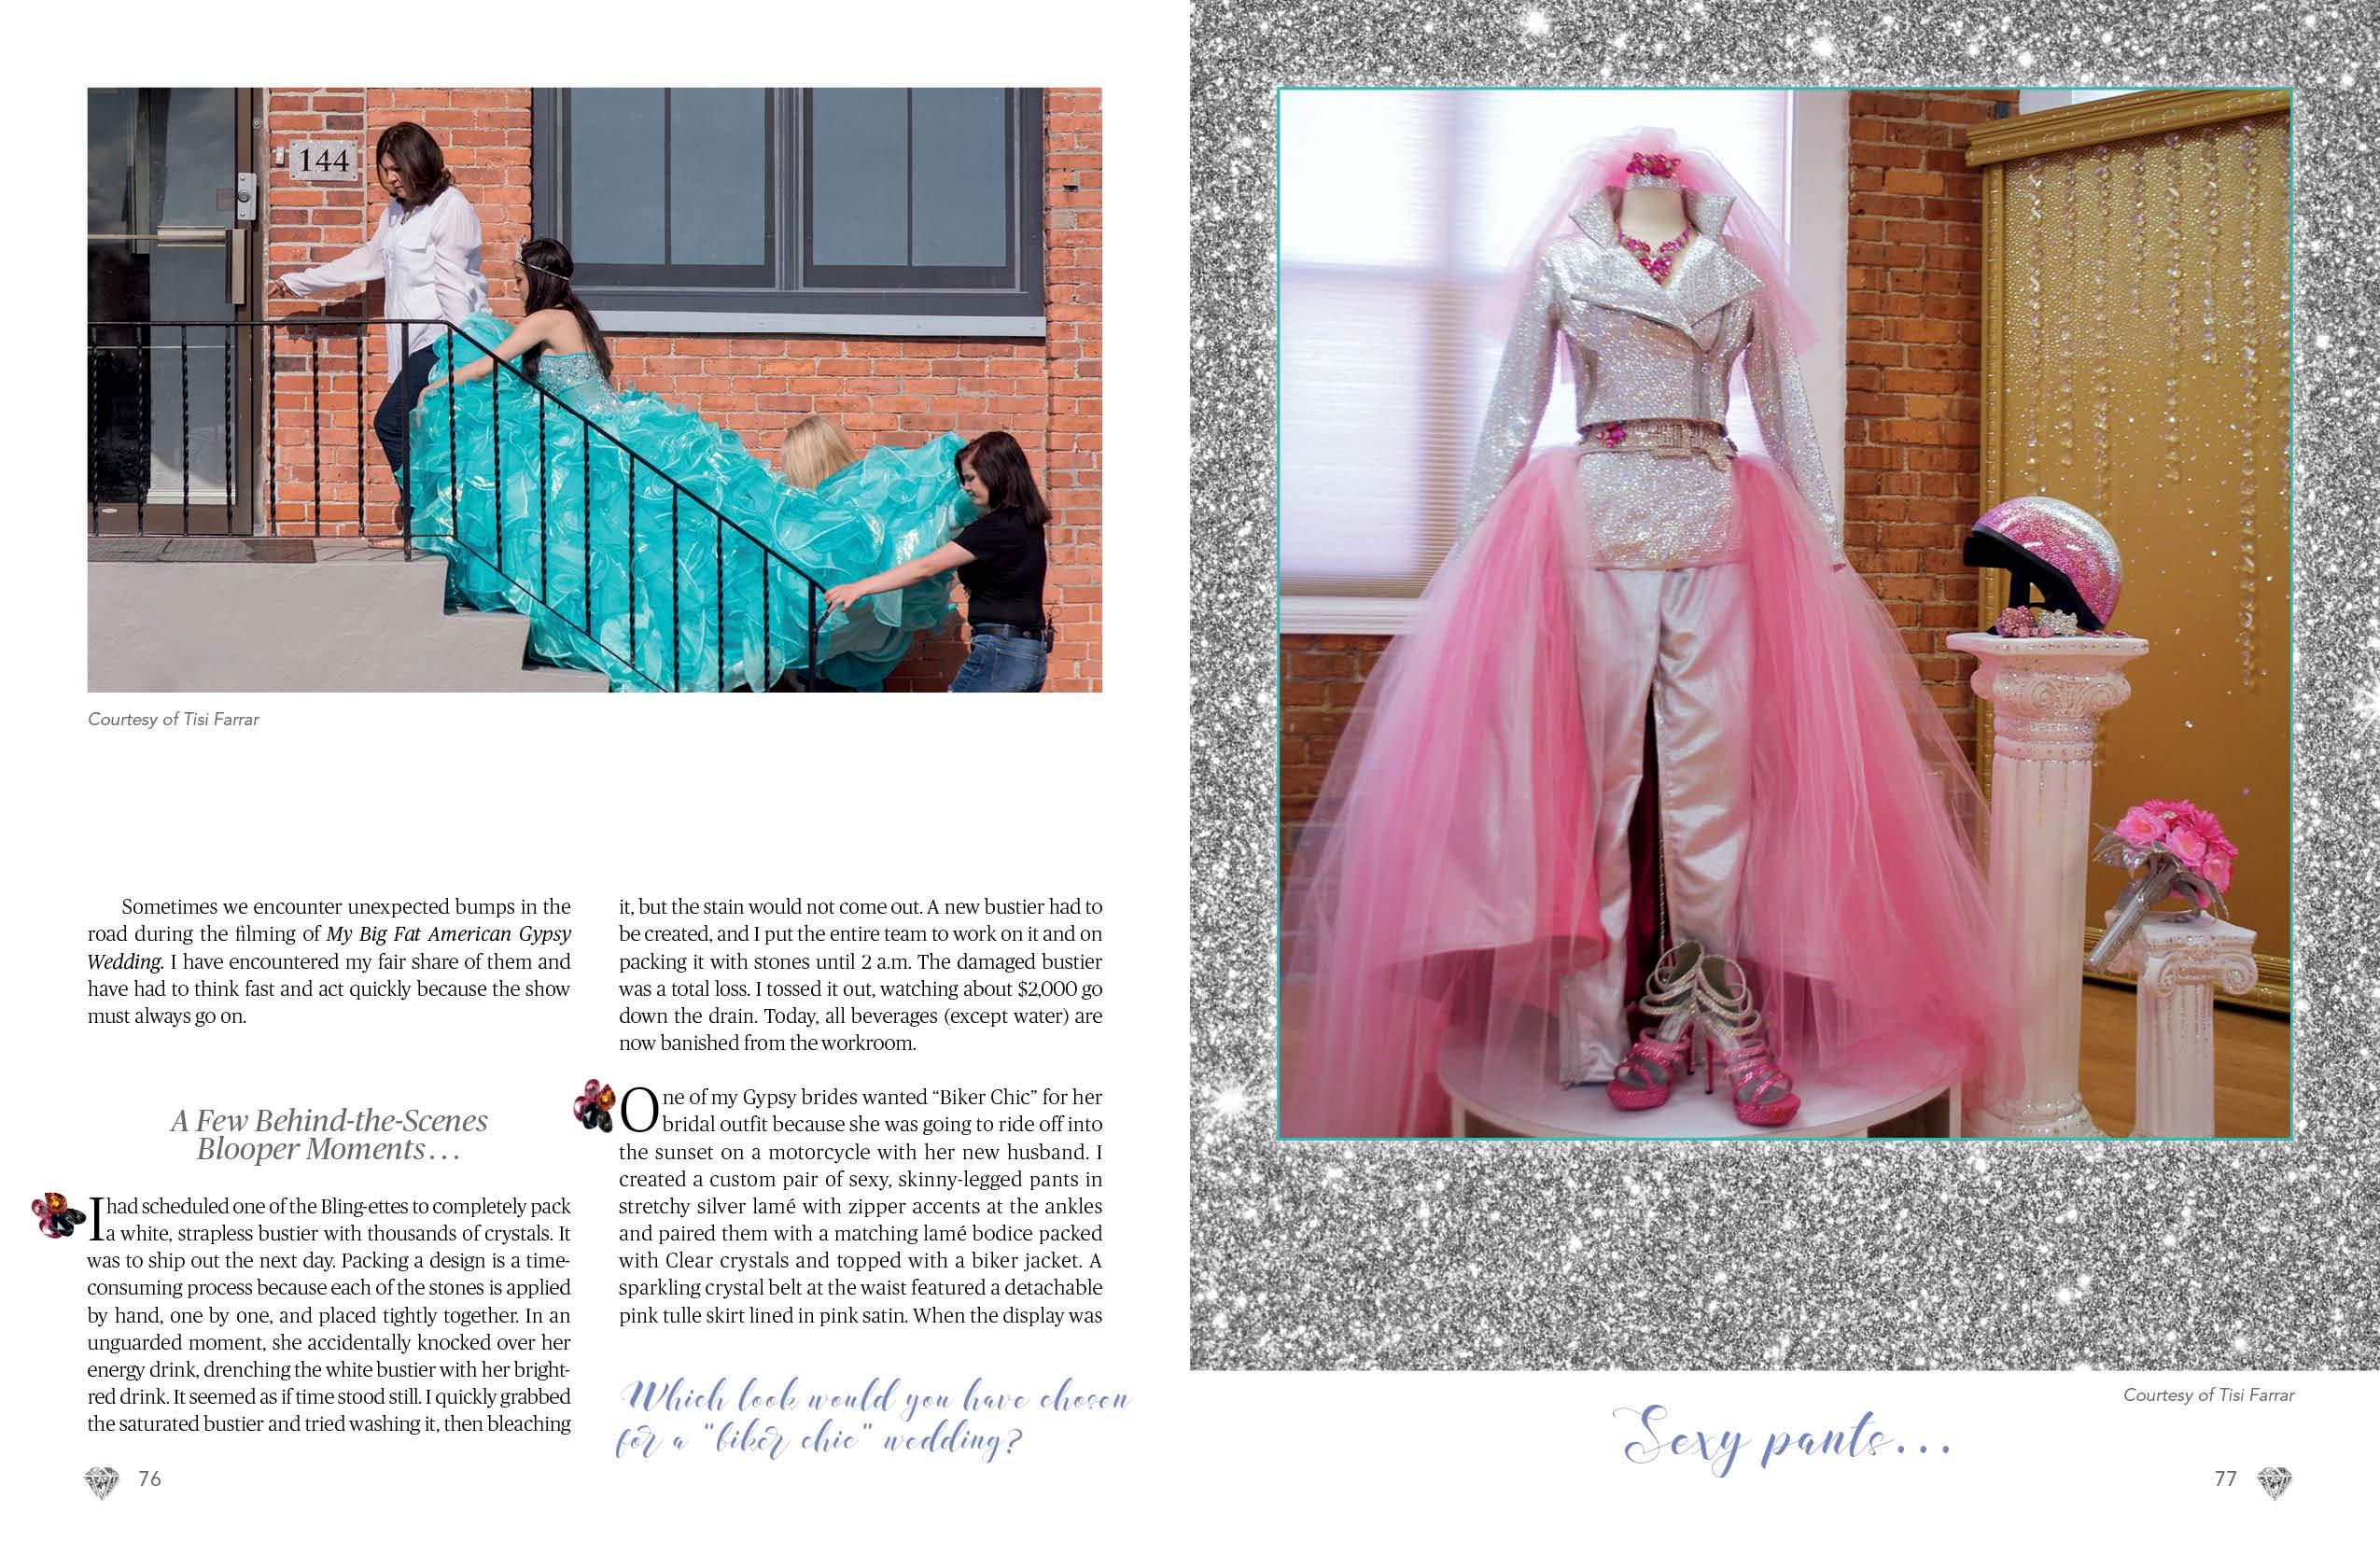 738fed3932e9 Bling!: The Uncommon Crystal Couture World of Sondra Celli: Sondra Celli,  Tisi Farrar: 9780764357336: Amazon.com: Books